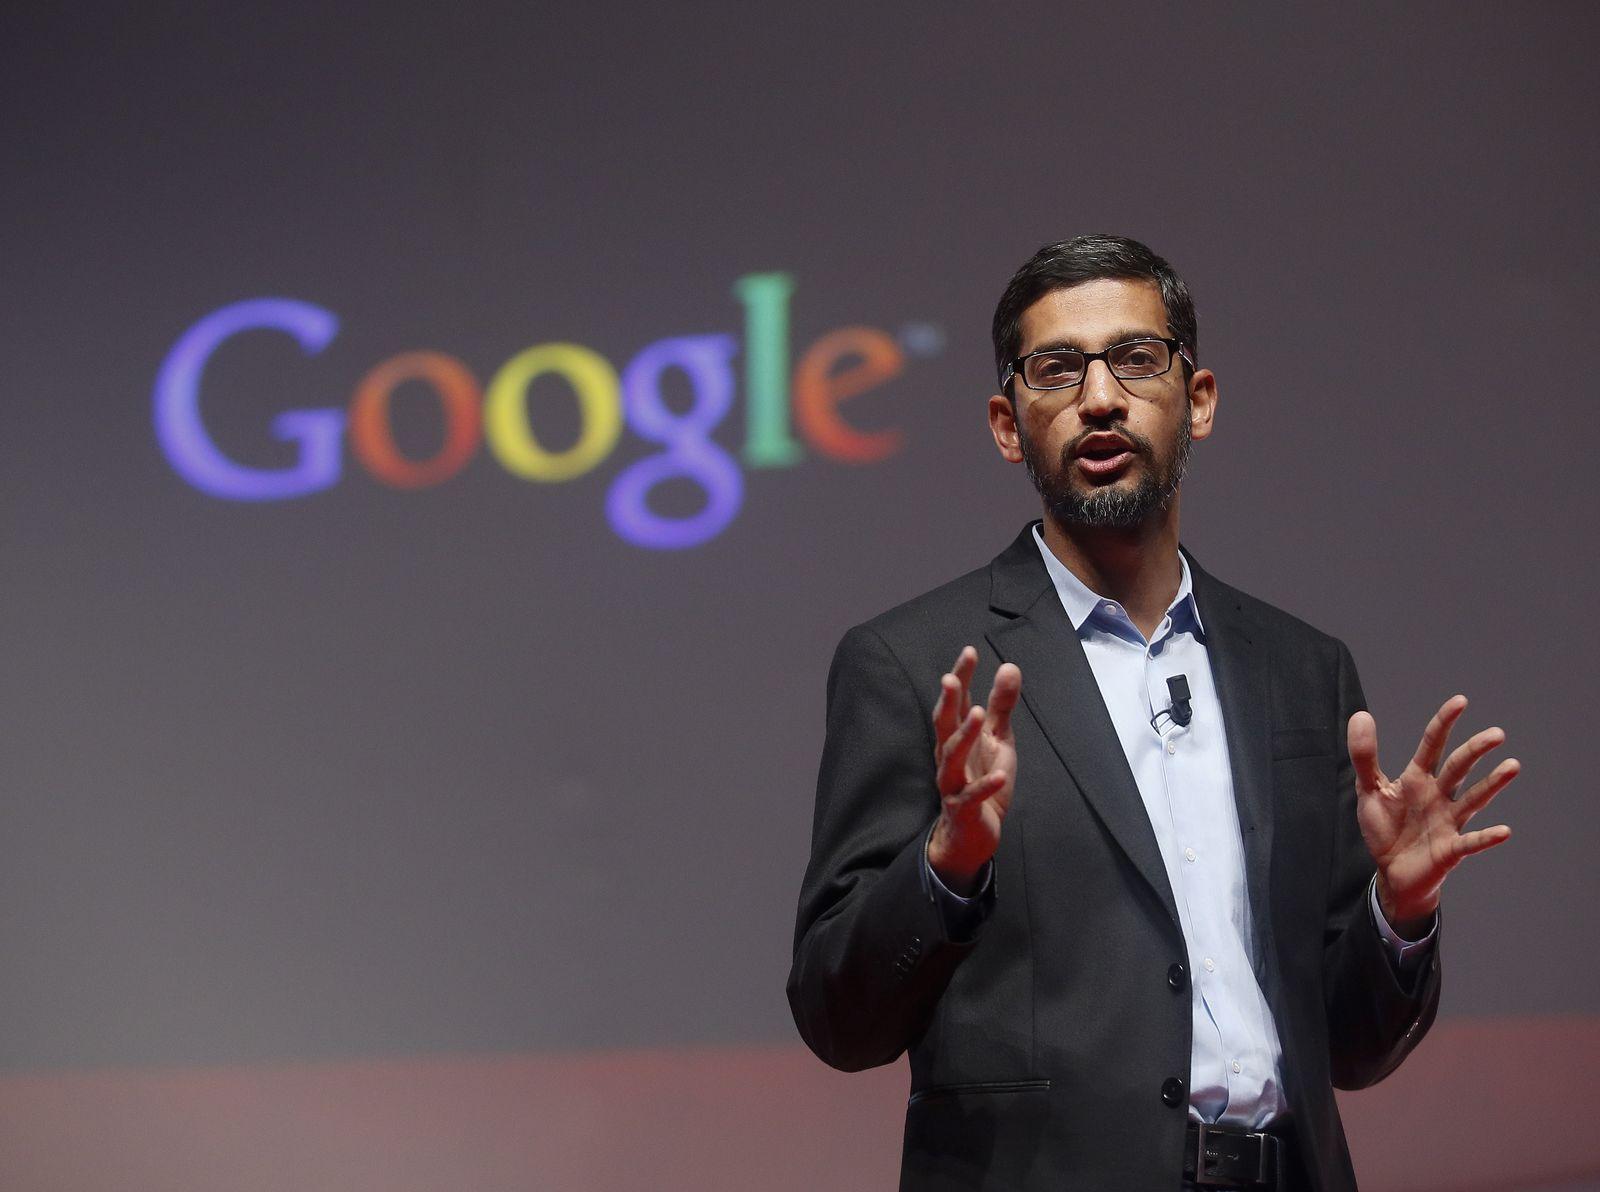 Sundar Pichai / Google